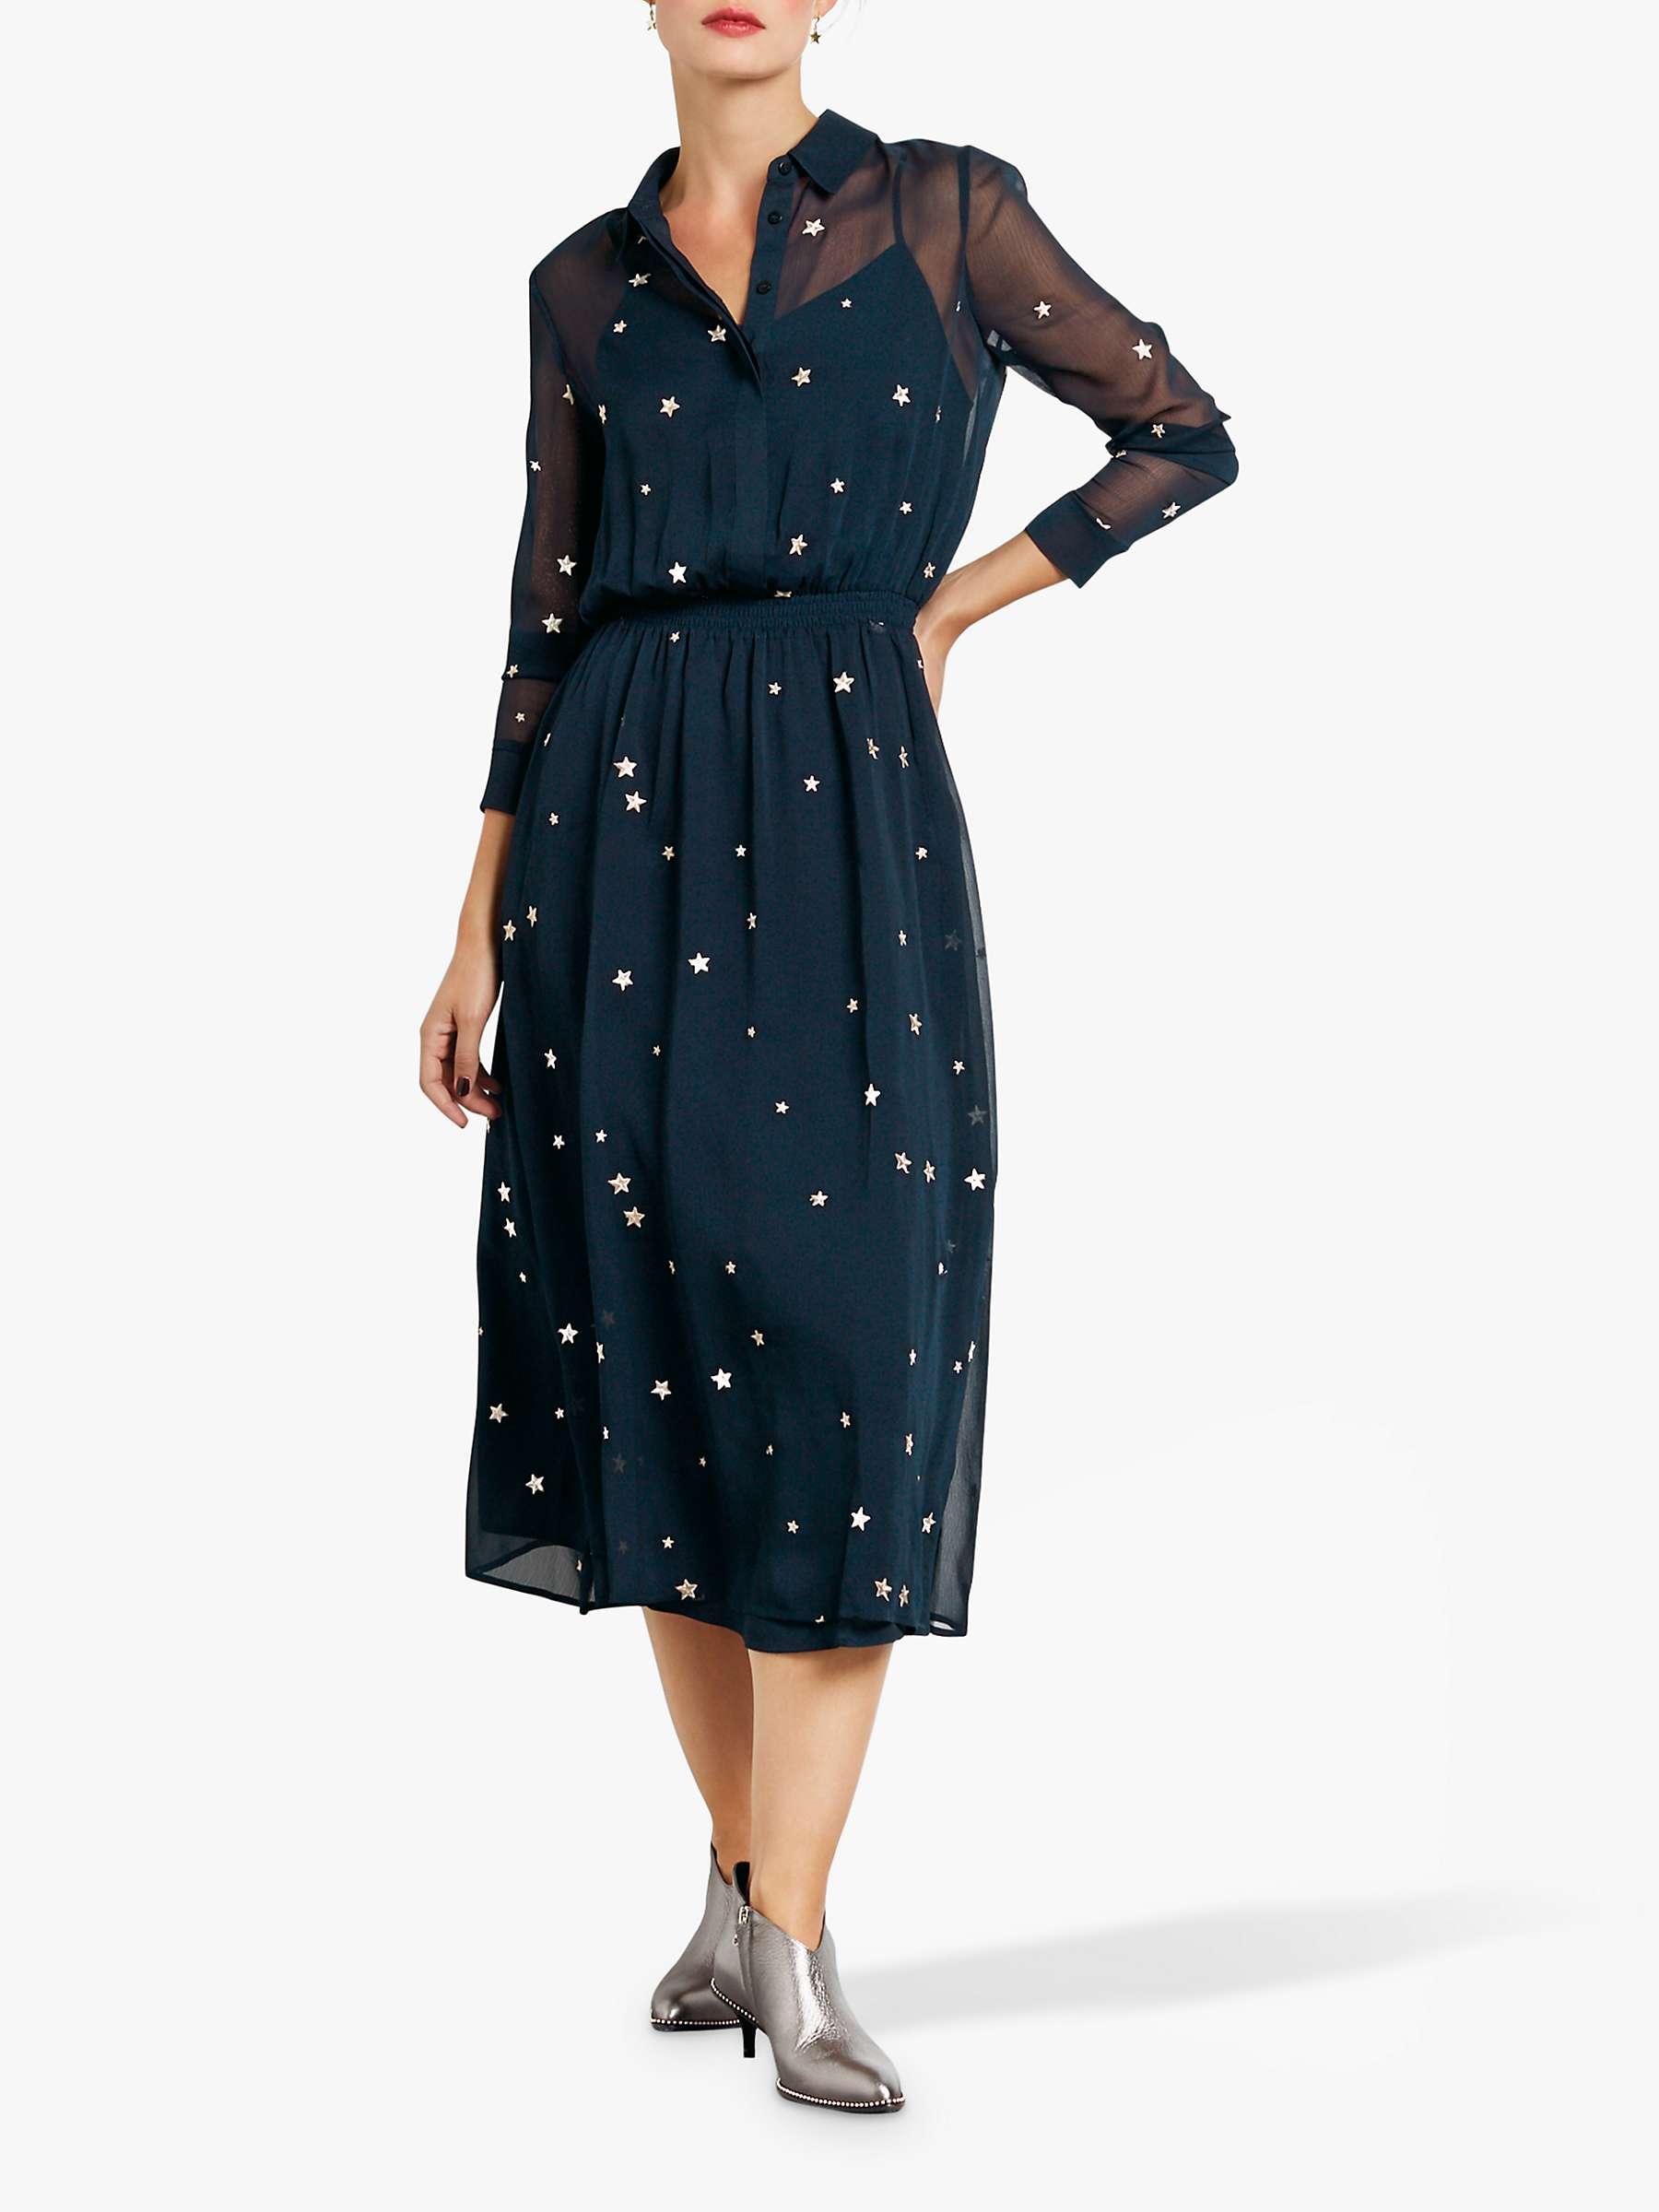 Hush Gloria Shirt Dress, Navy by John Lewis